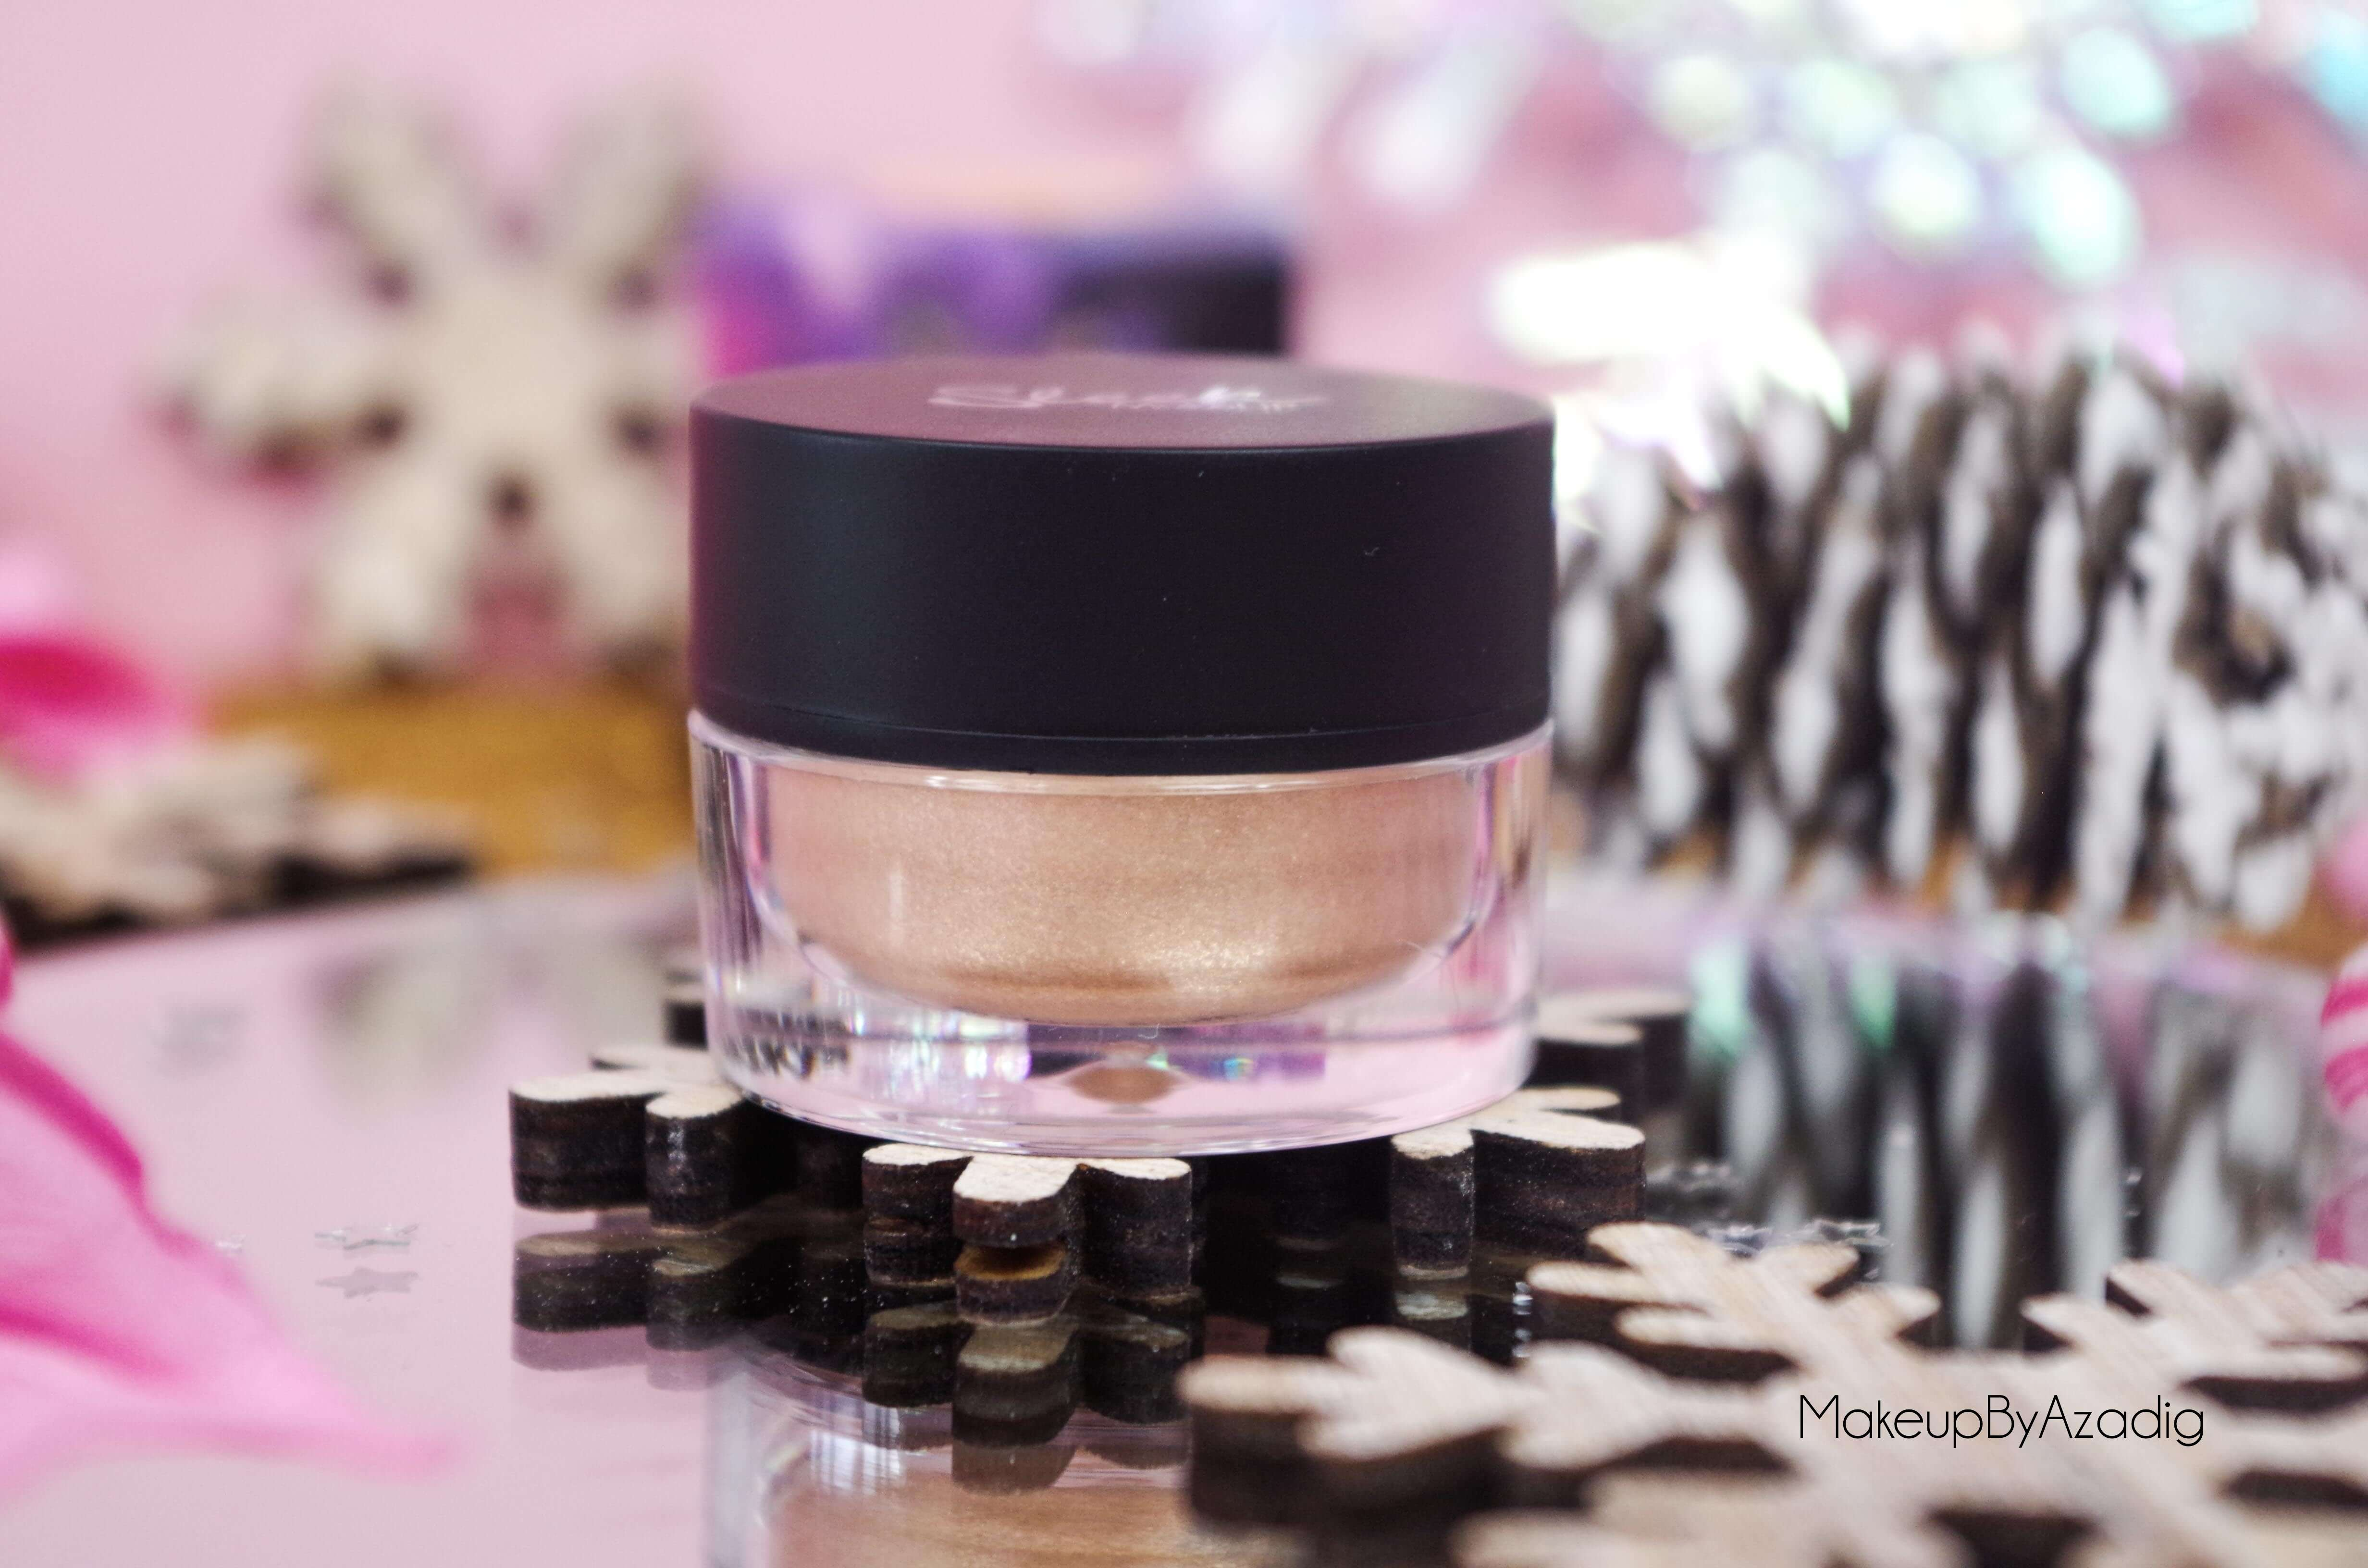 highlighter-sleek-makeup-strobing-souffle-smoky-quartz-sephora-swatch-makeupbyazadig-avis-verre